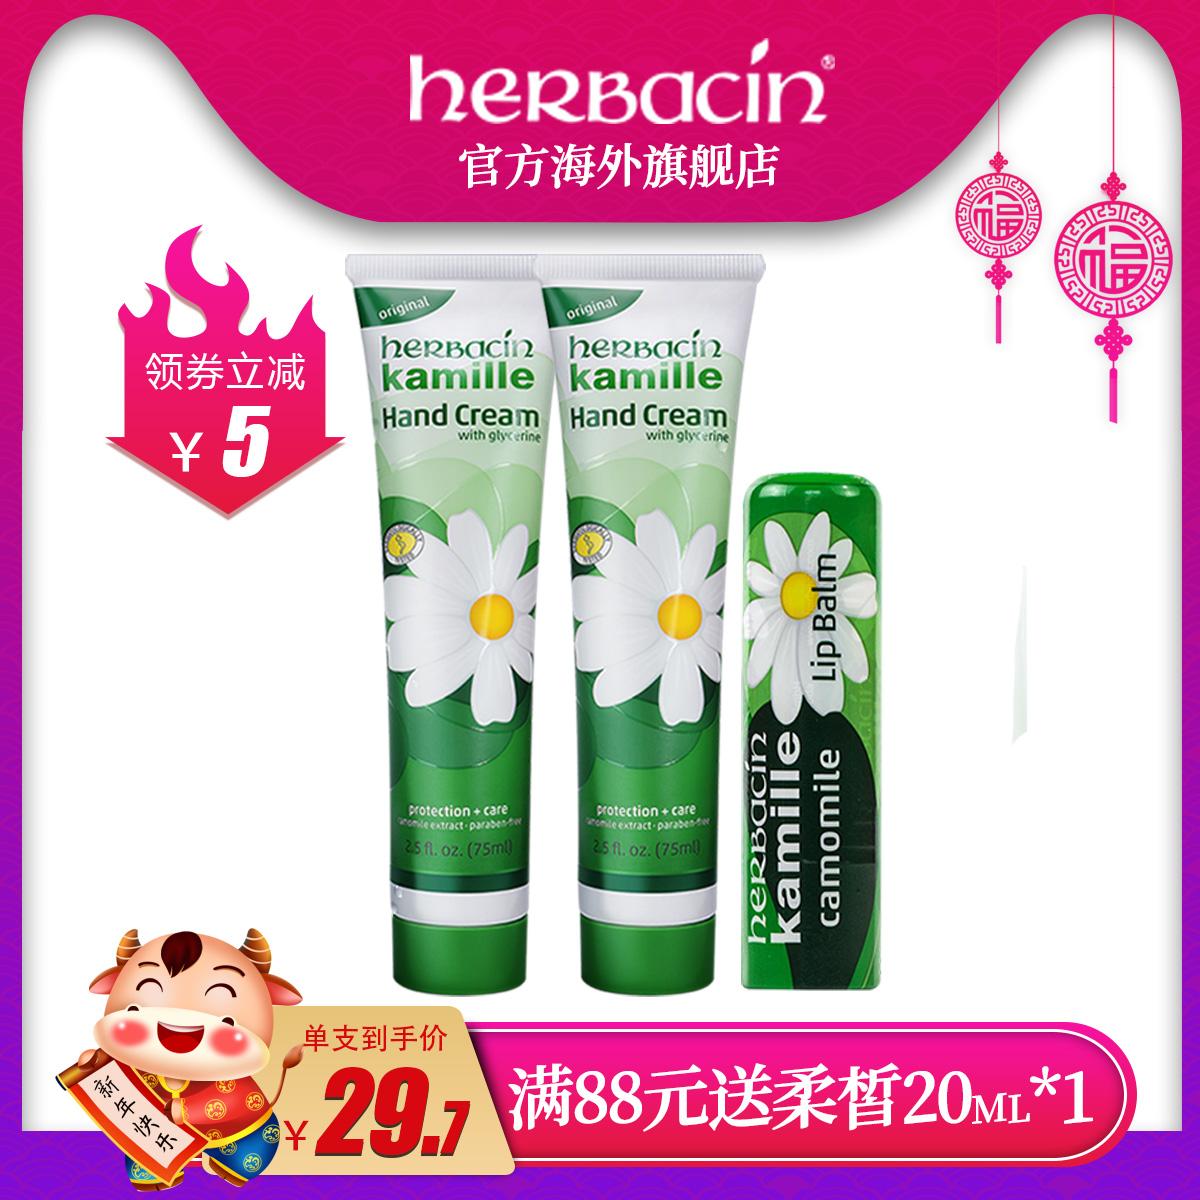 Herbacin德国贺本清小甘菊护手霜75ml*2支+润唇膏